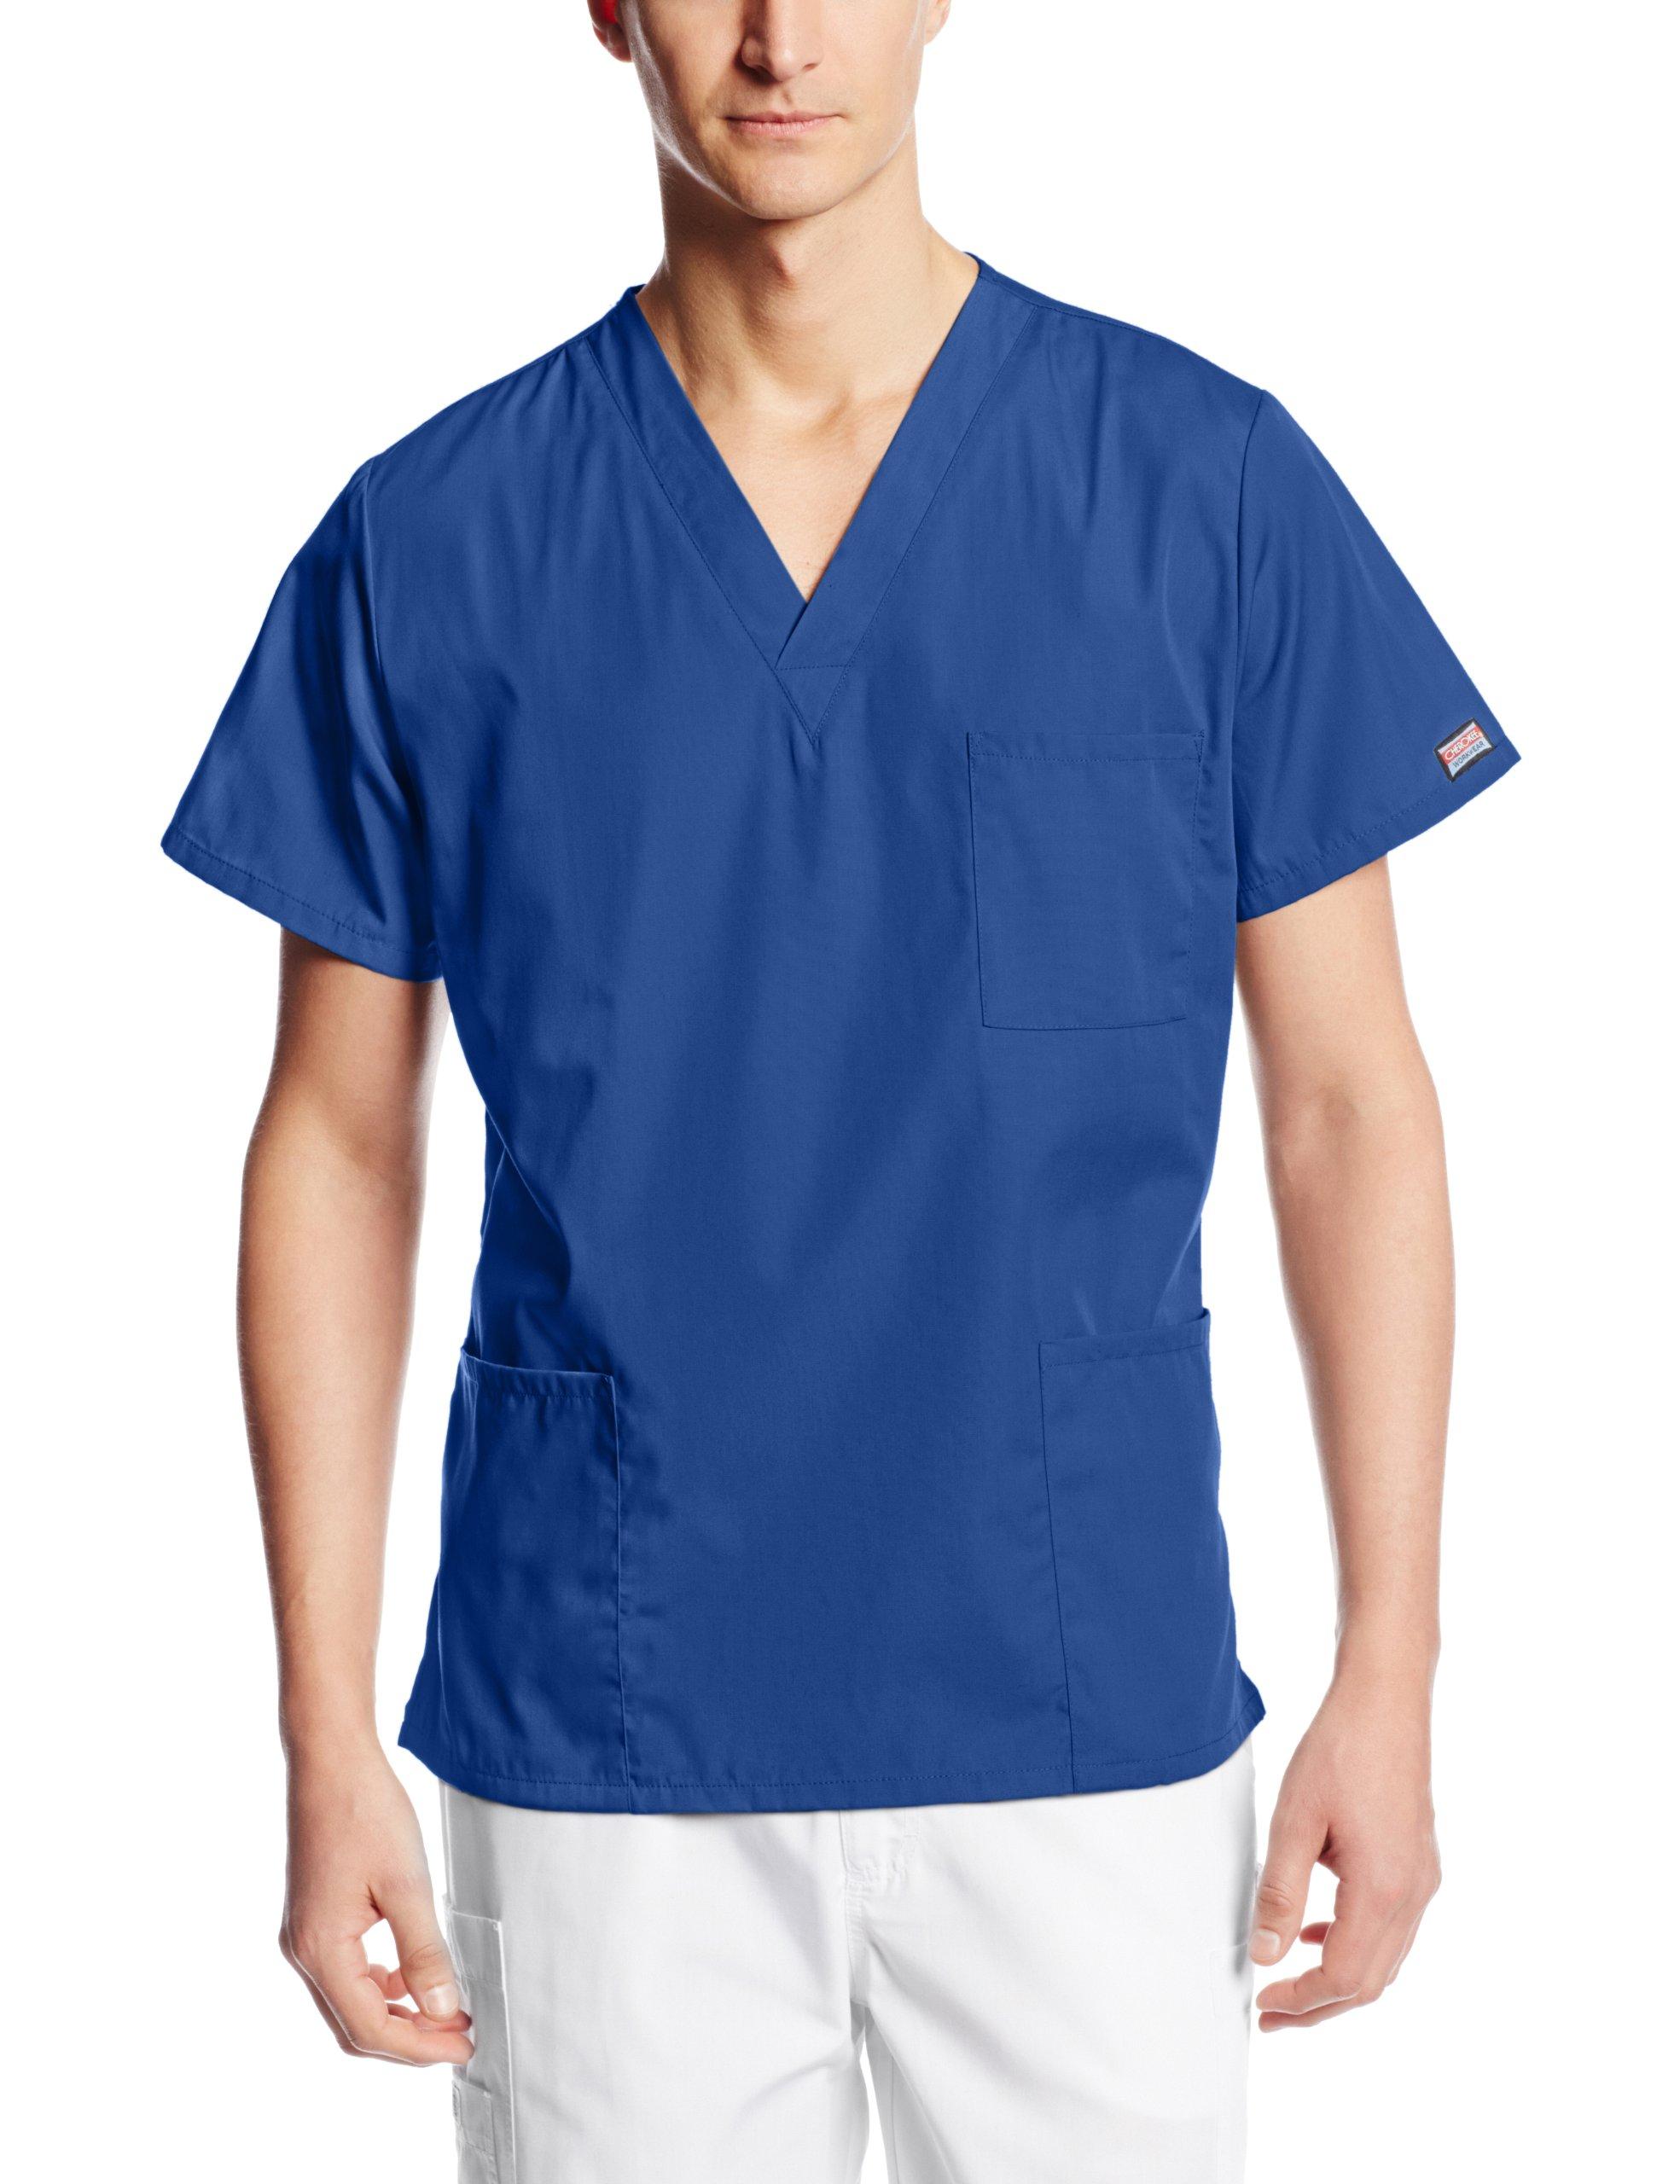 Cherokee Workwear Scrubs Unisex V-Neck Top, Galaxy Blue, Large